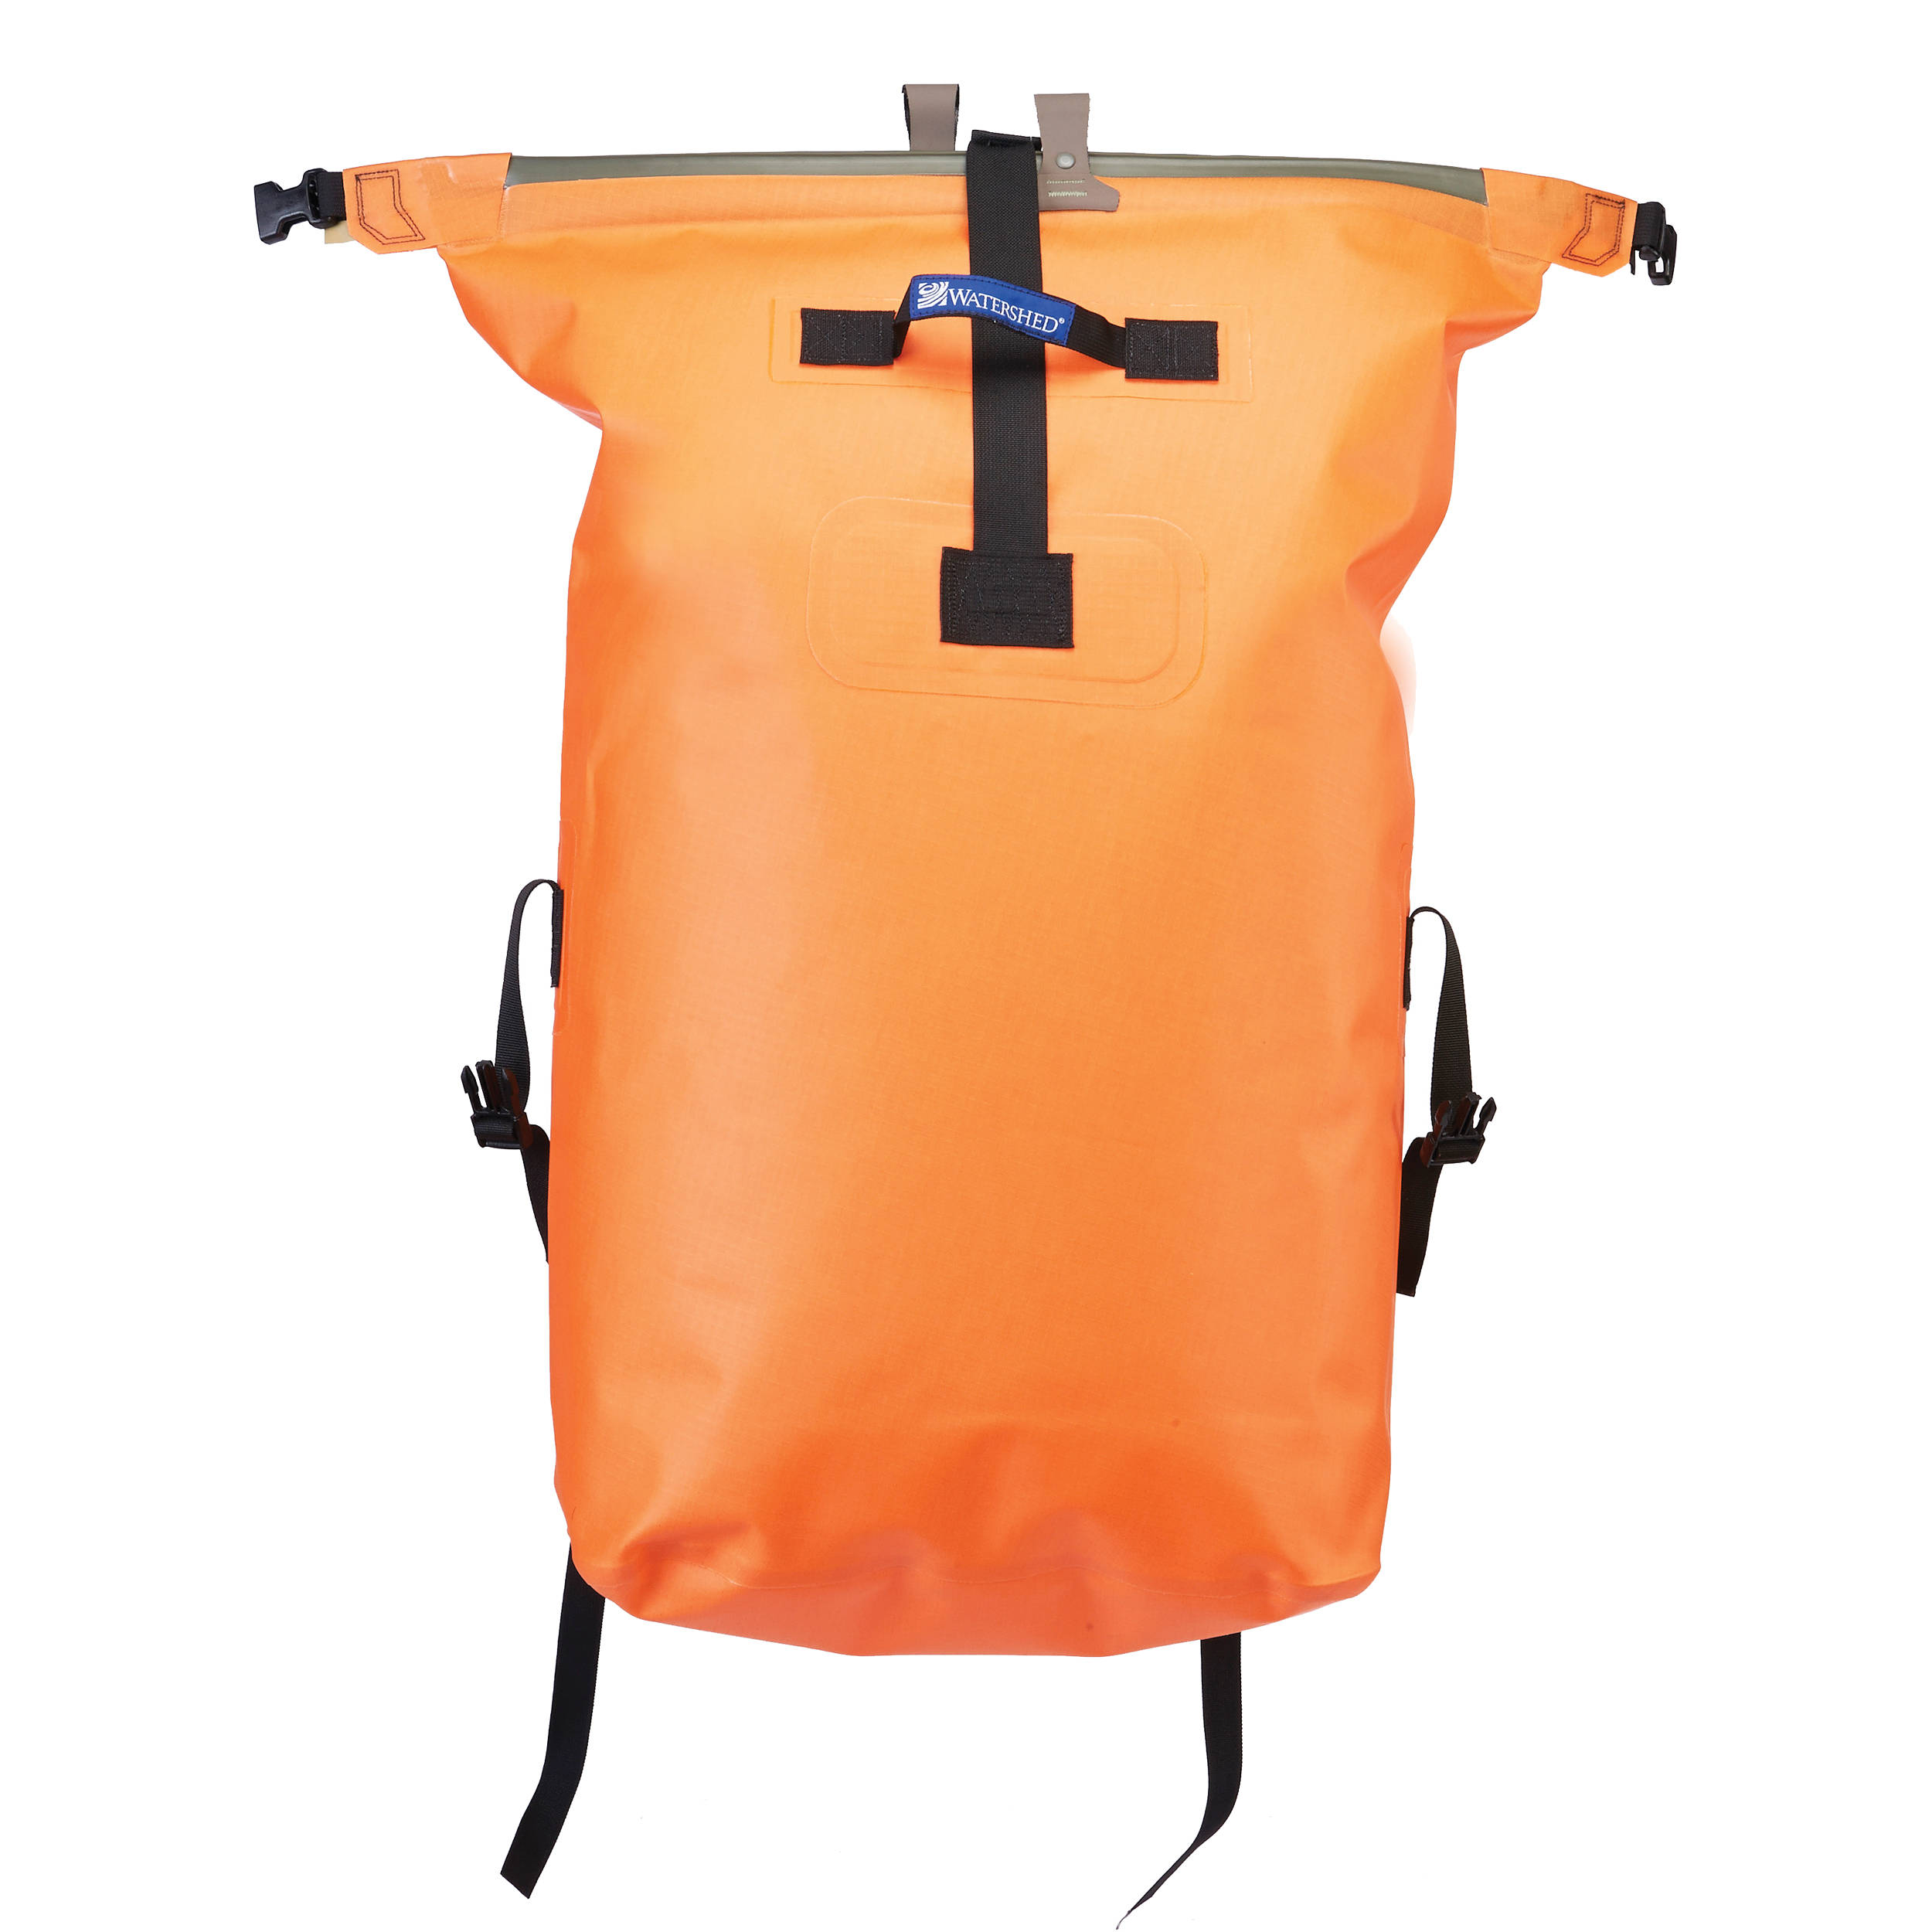 d48941aa8f WATERSHED Westwater Backpack (Orange) FGW-WW-ORG B H Photo Video